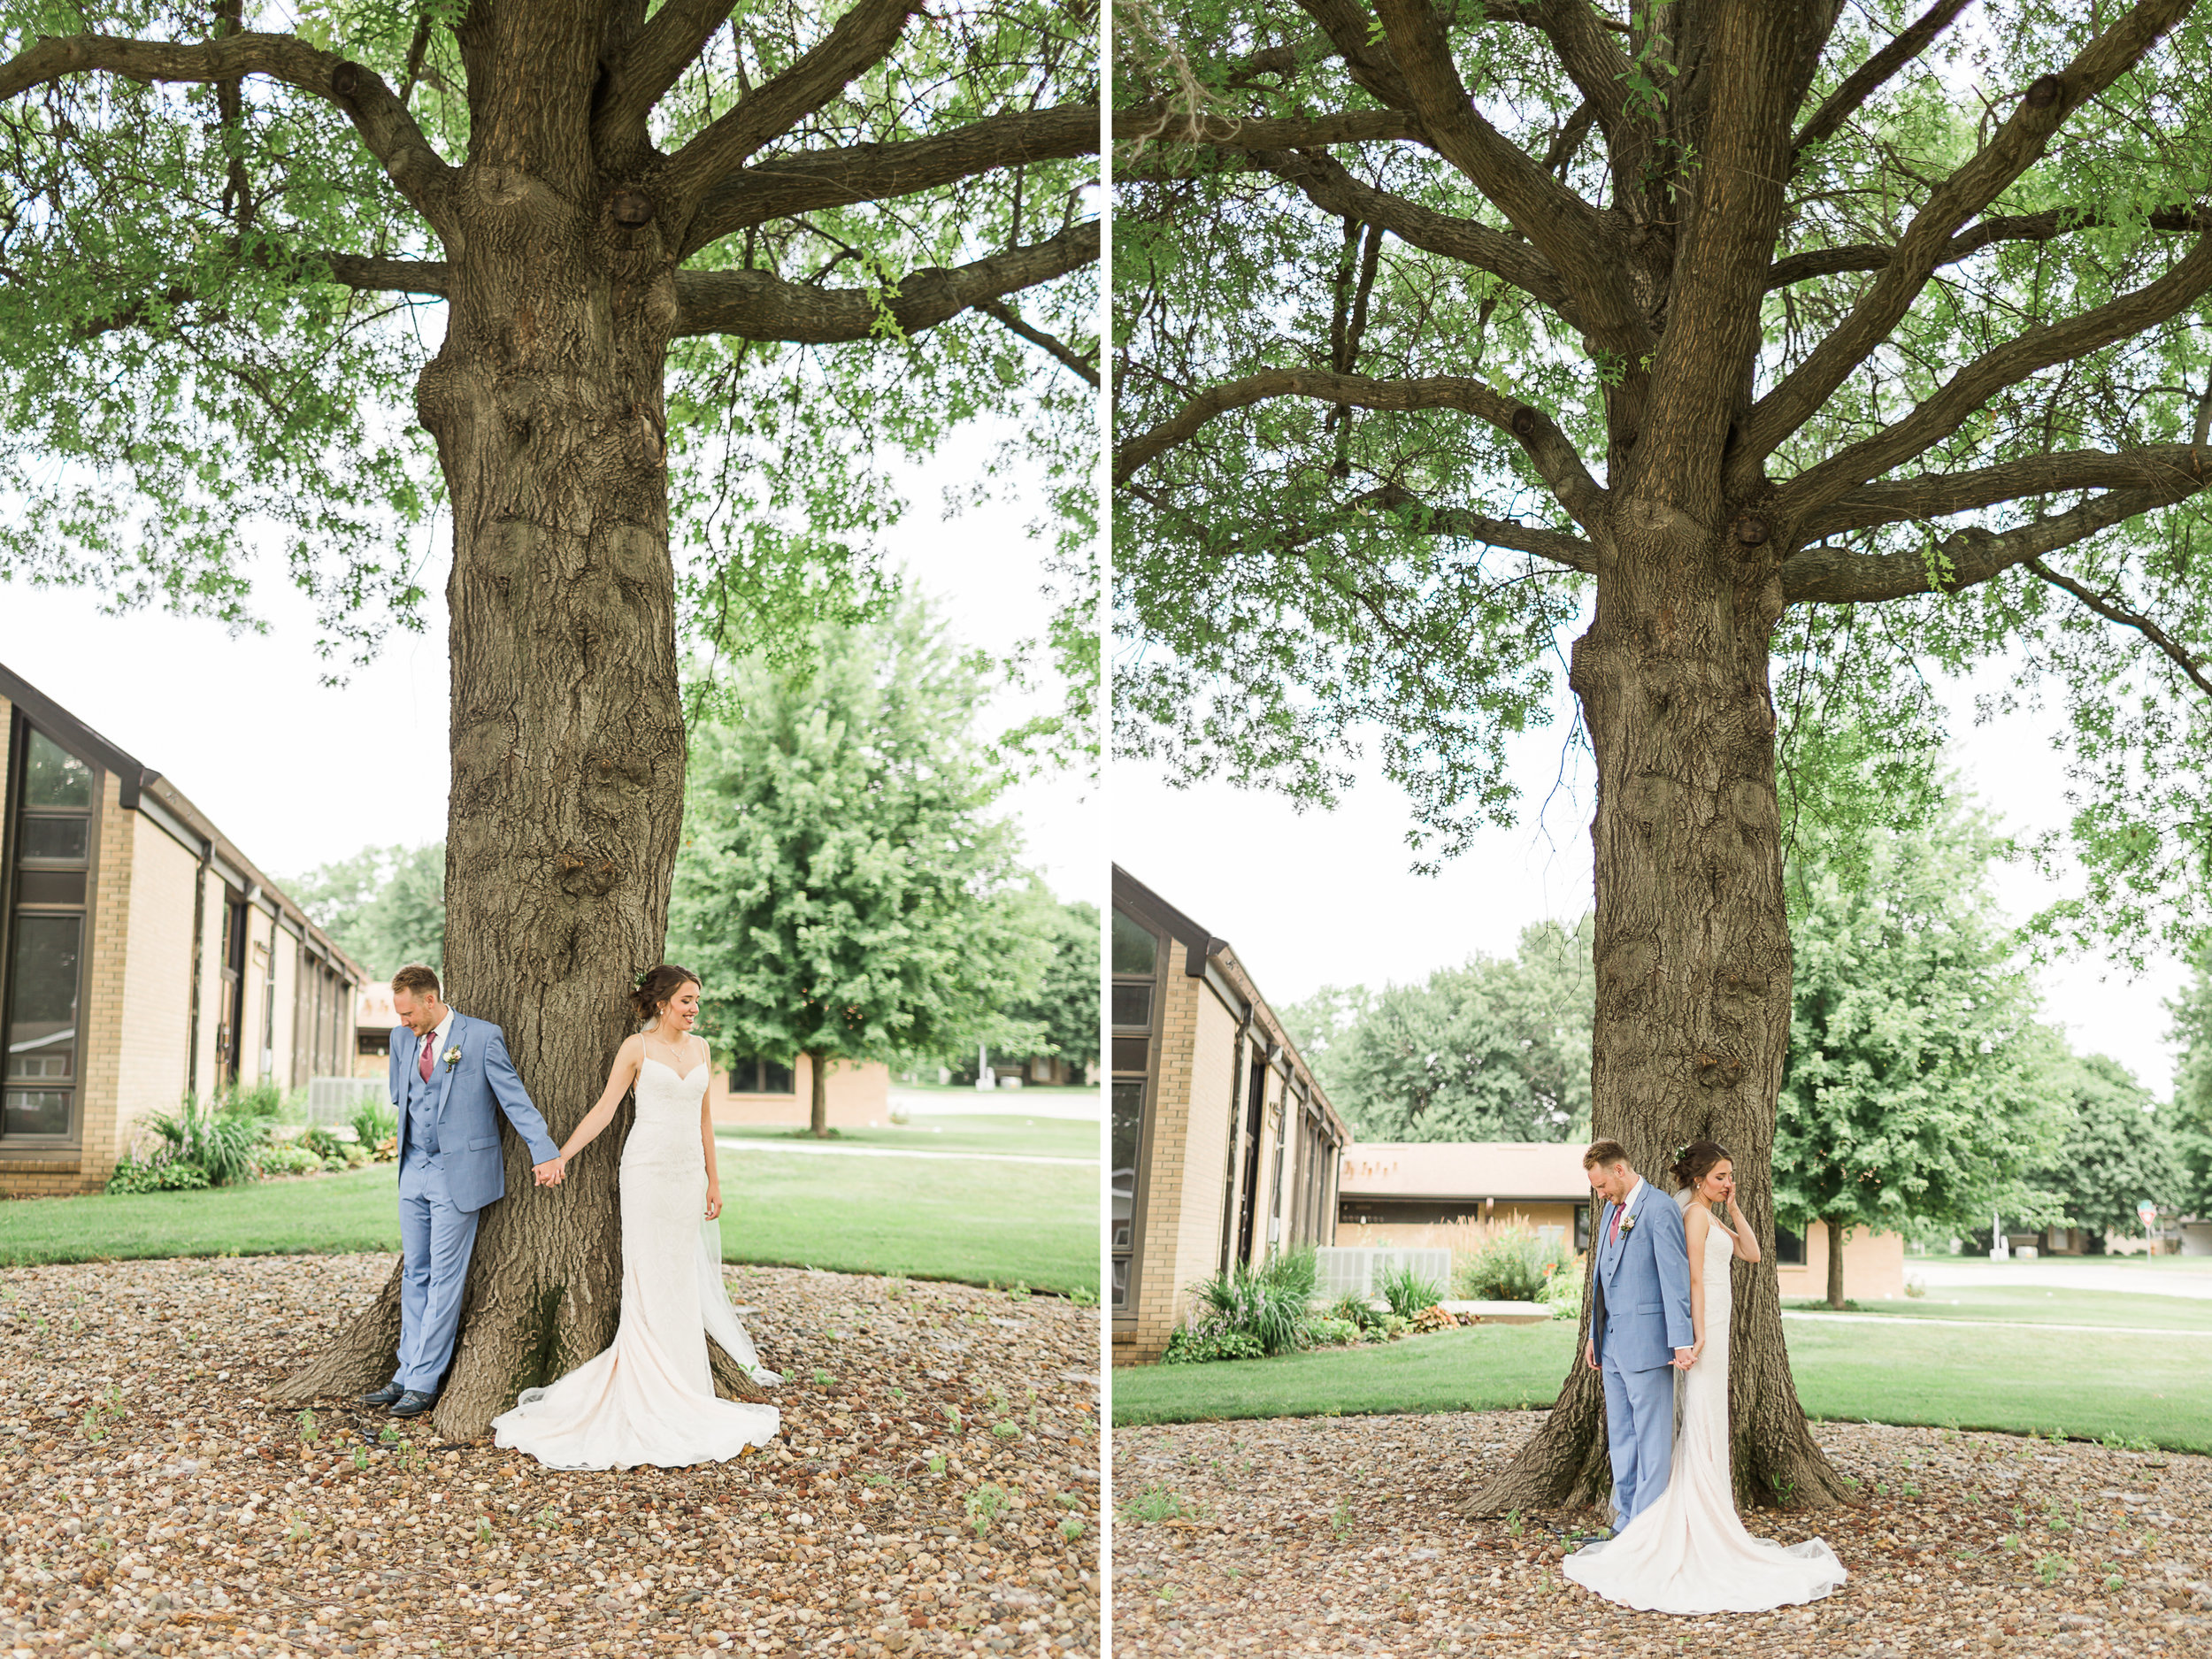 calebclairewedding-5.jpg